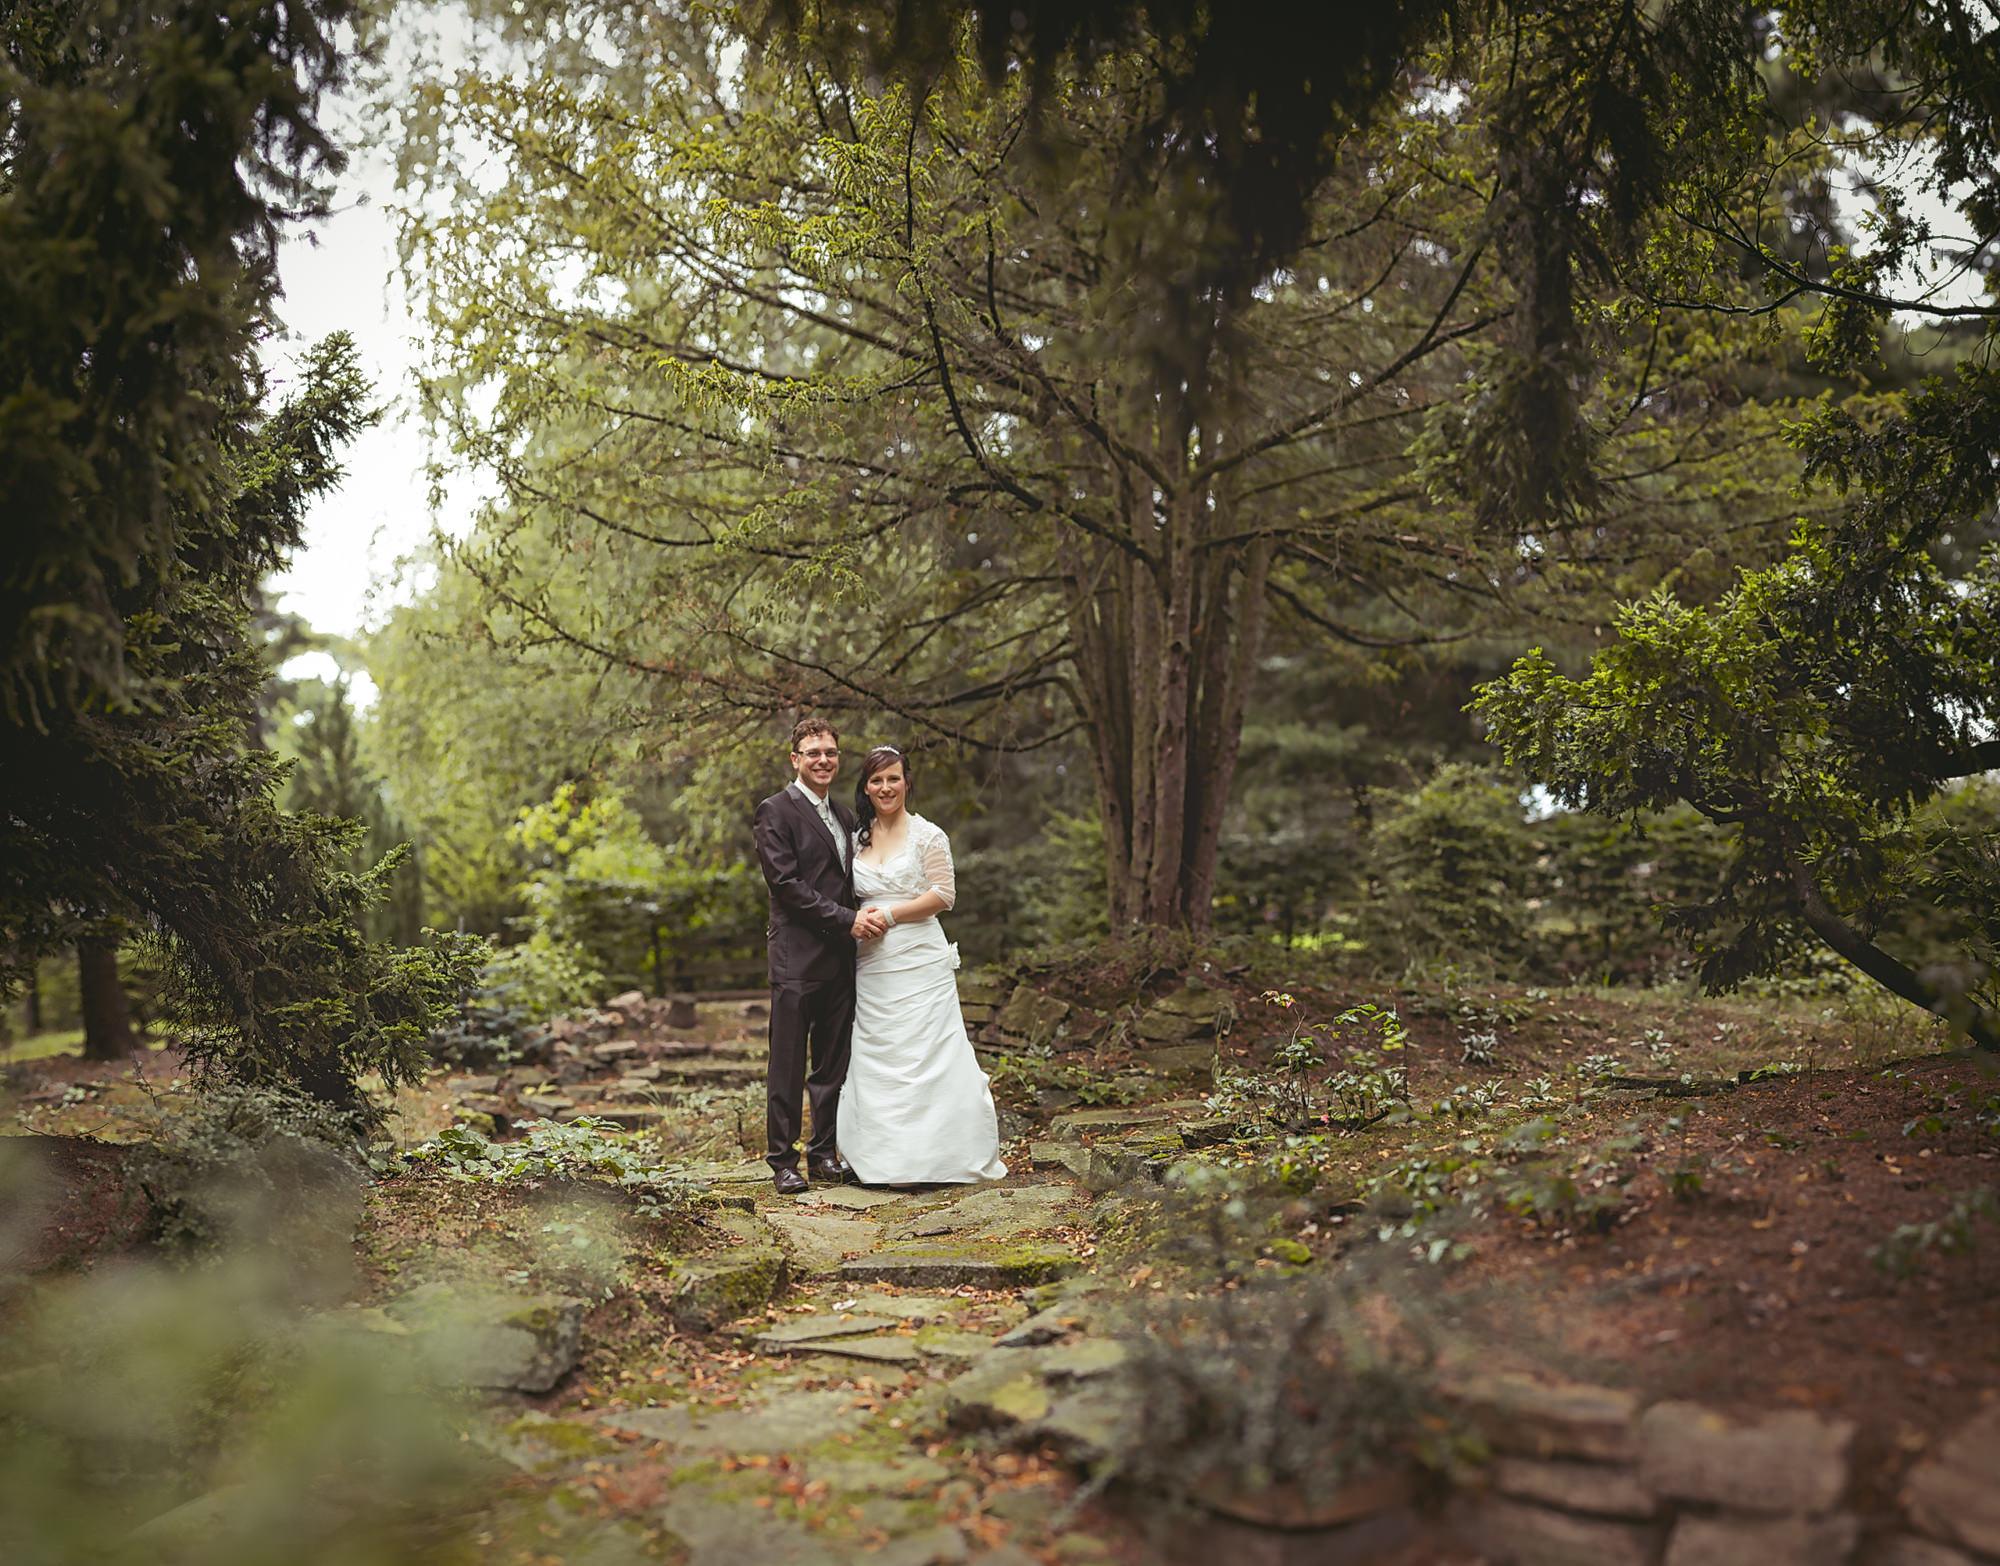 hochzeit-junke-wedding-photographer-maik-kleinert-canon-001.jpg